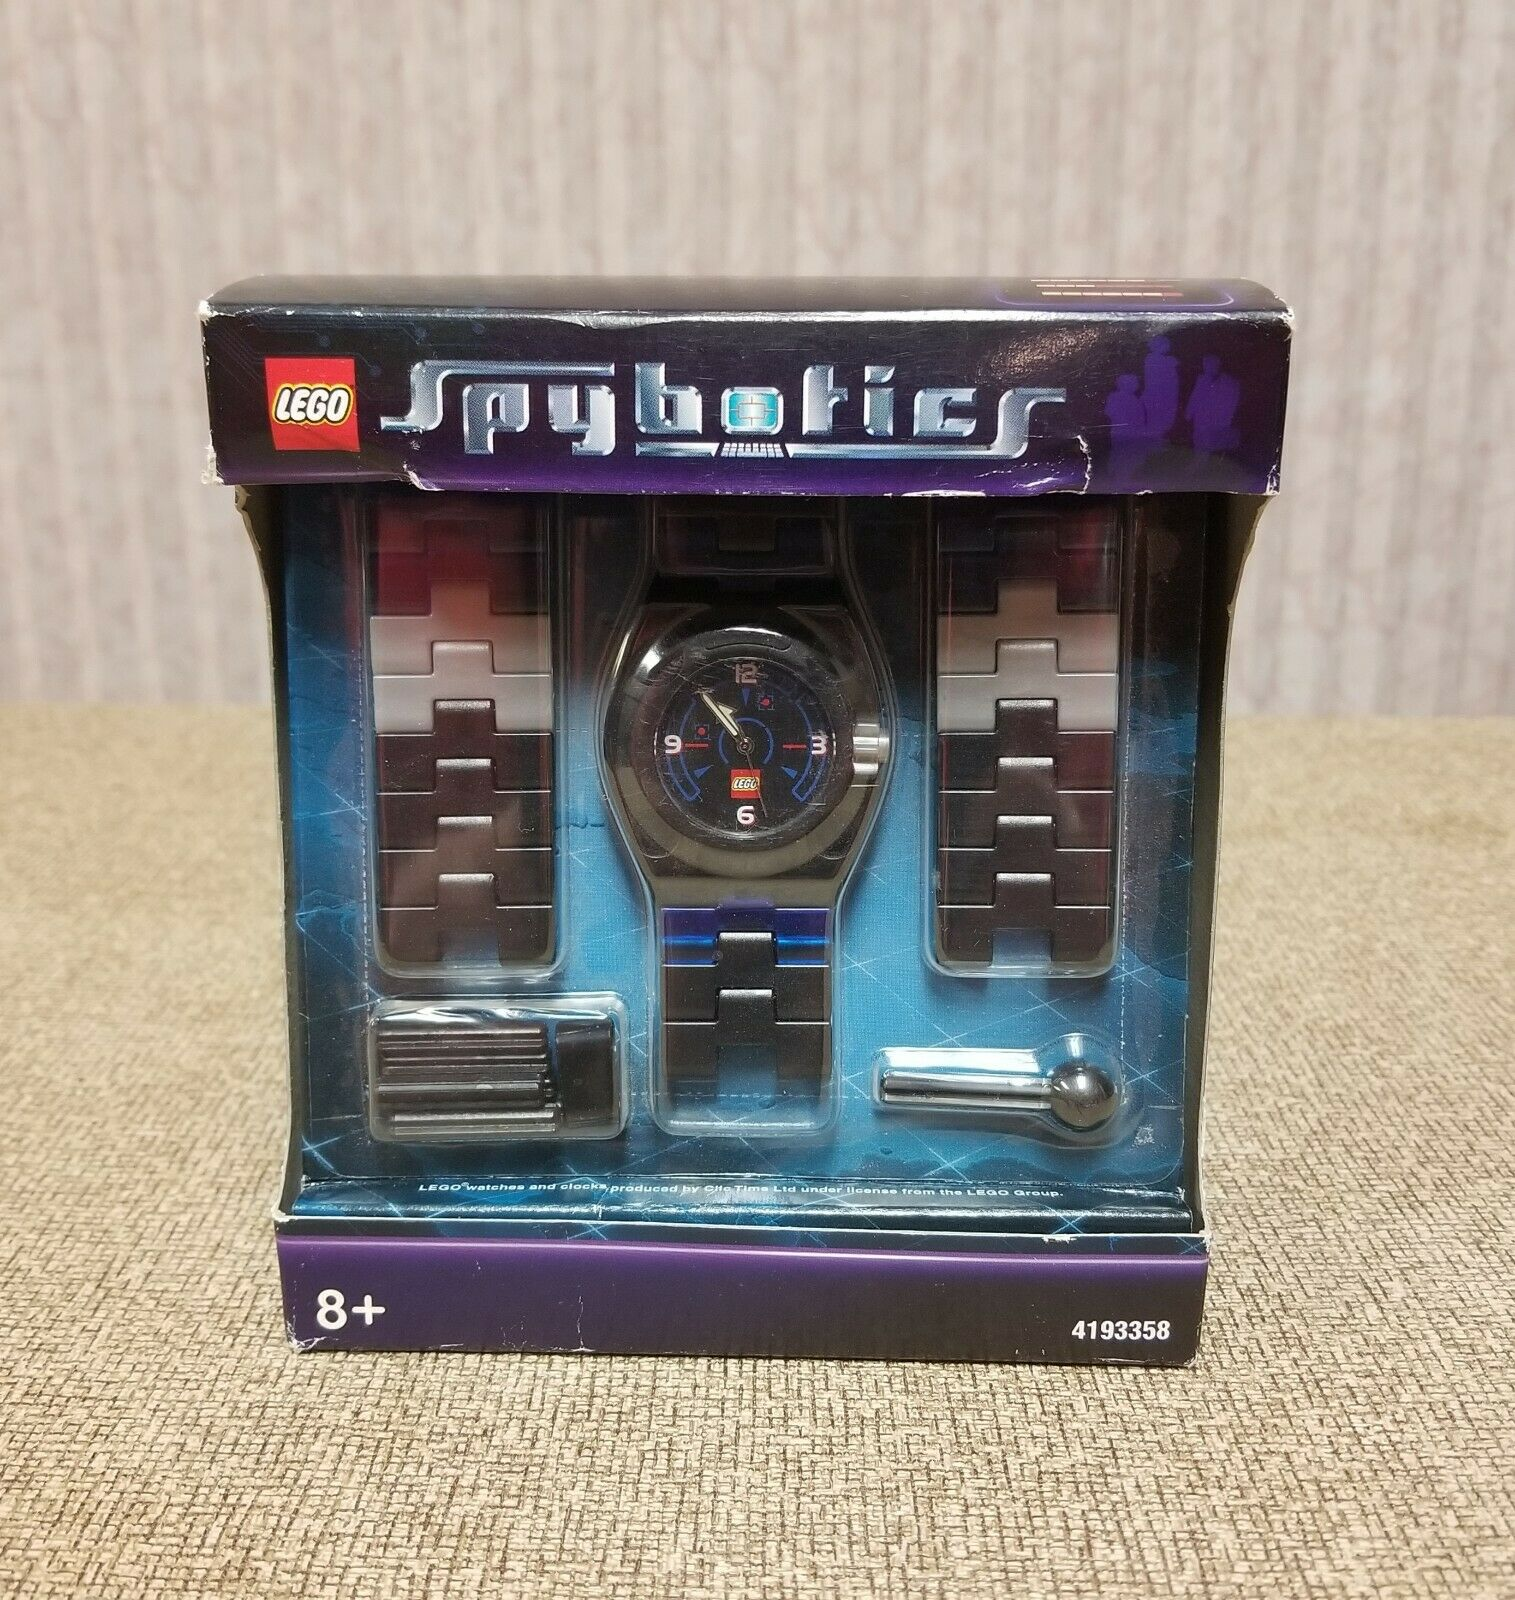 Lego Spybotics Wrist Watch 4193358 Factory Sealed - RARE